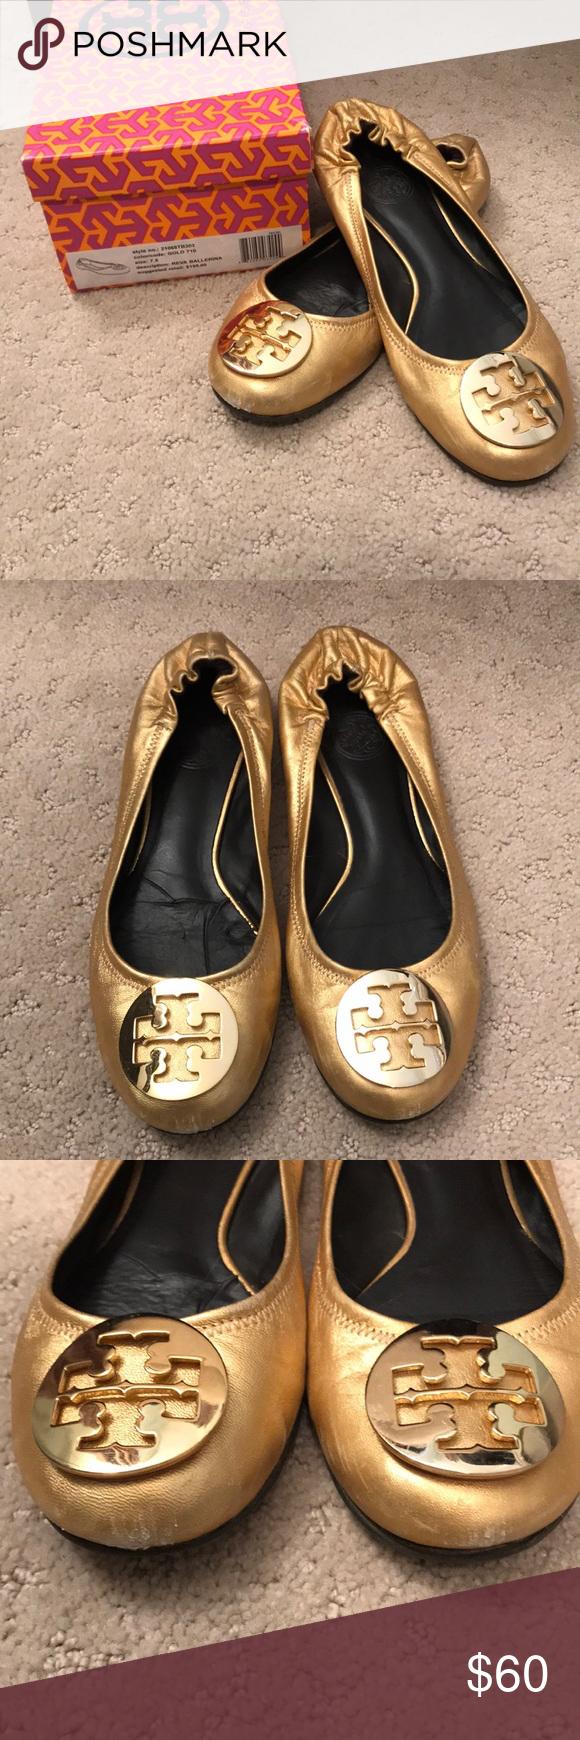 758c5bfa0b267f Authentic Tory Burch Gold Reva Ballet Flats 7.5 Authentic Tory Burch Reva  ballerina flats size 7.5 Made in Brazil